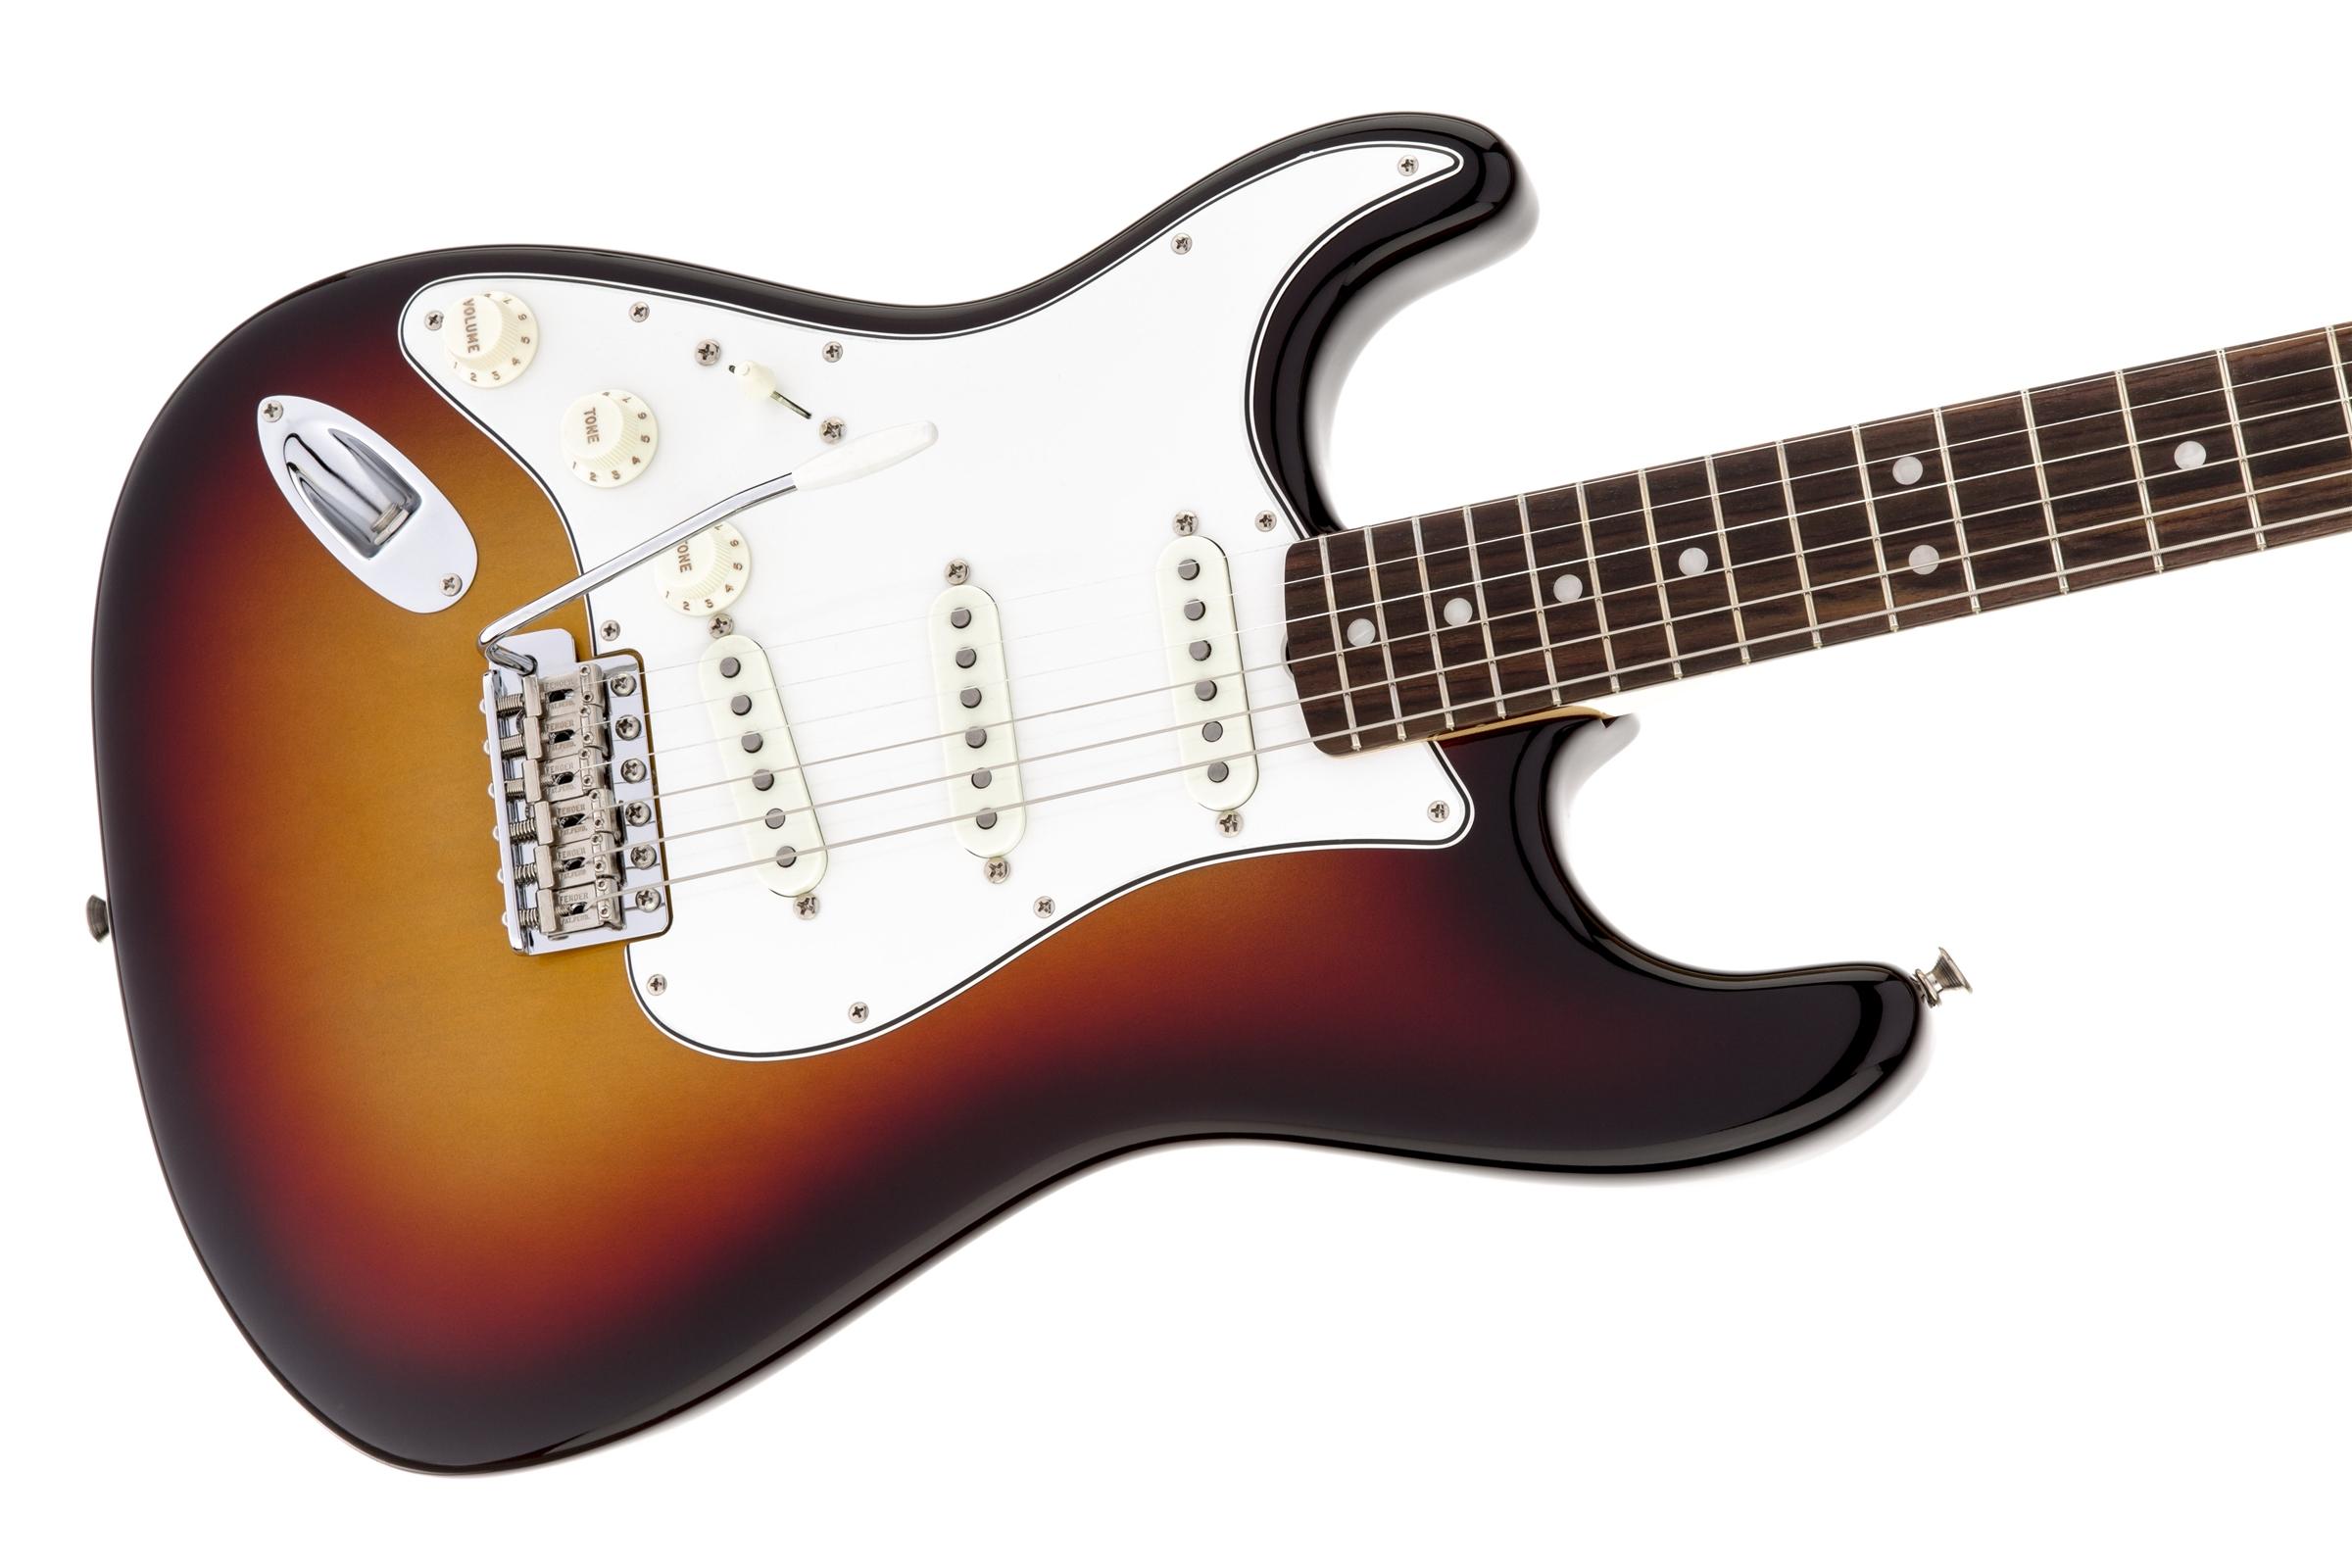 fender american professional jazzmaster wiring diagram starter solenoid vintage 3965 stratocaster left hand